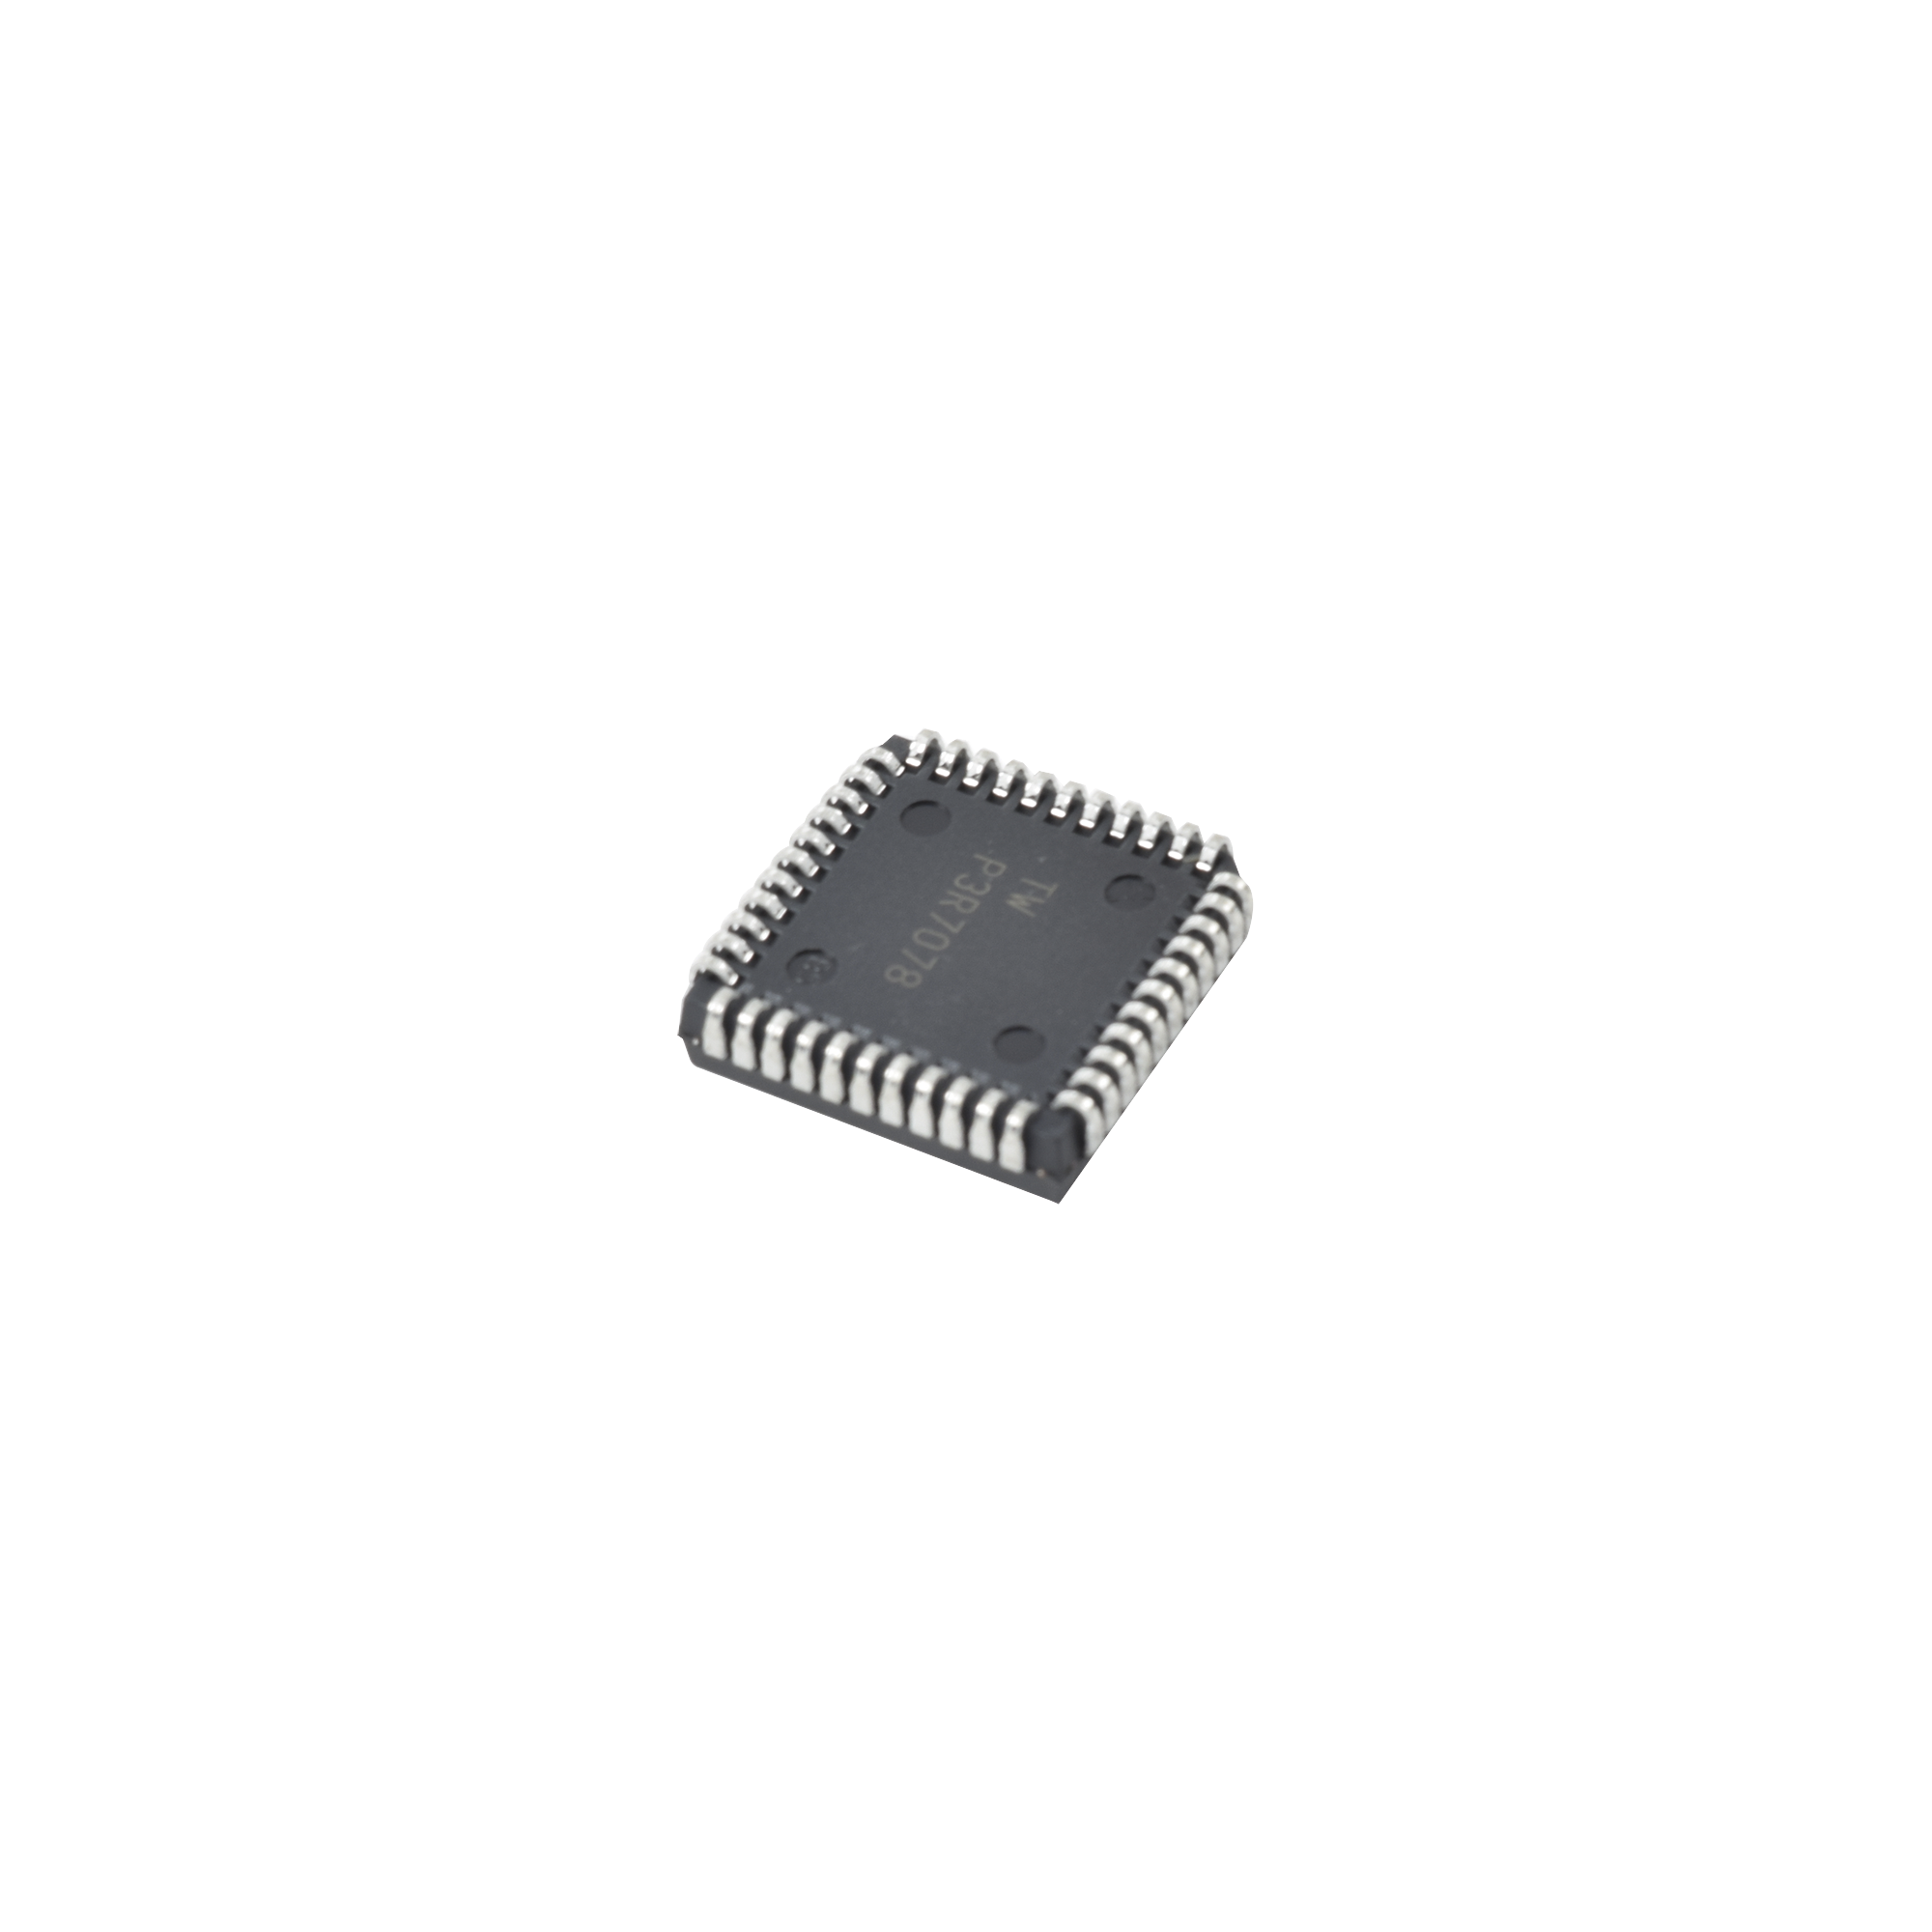 Chip para Hunter8 Rev 9.01 permite uso de App PIMAlink2.0